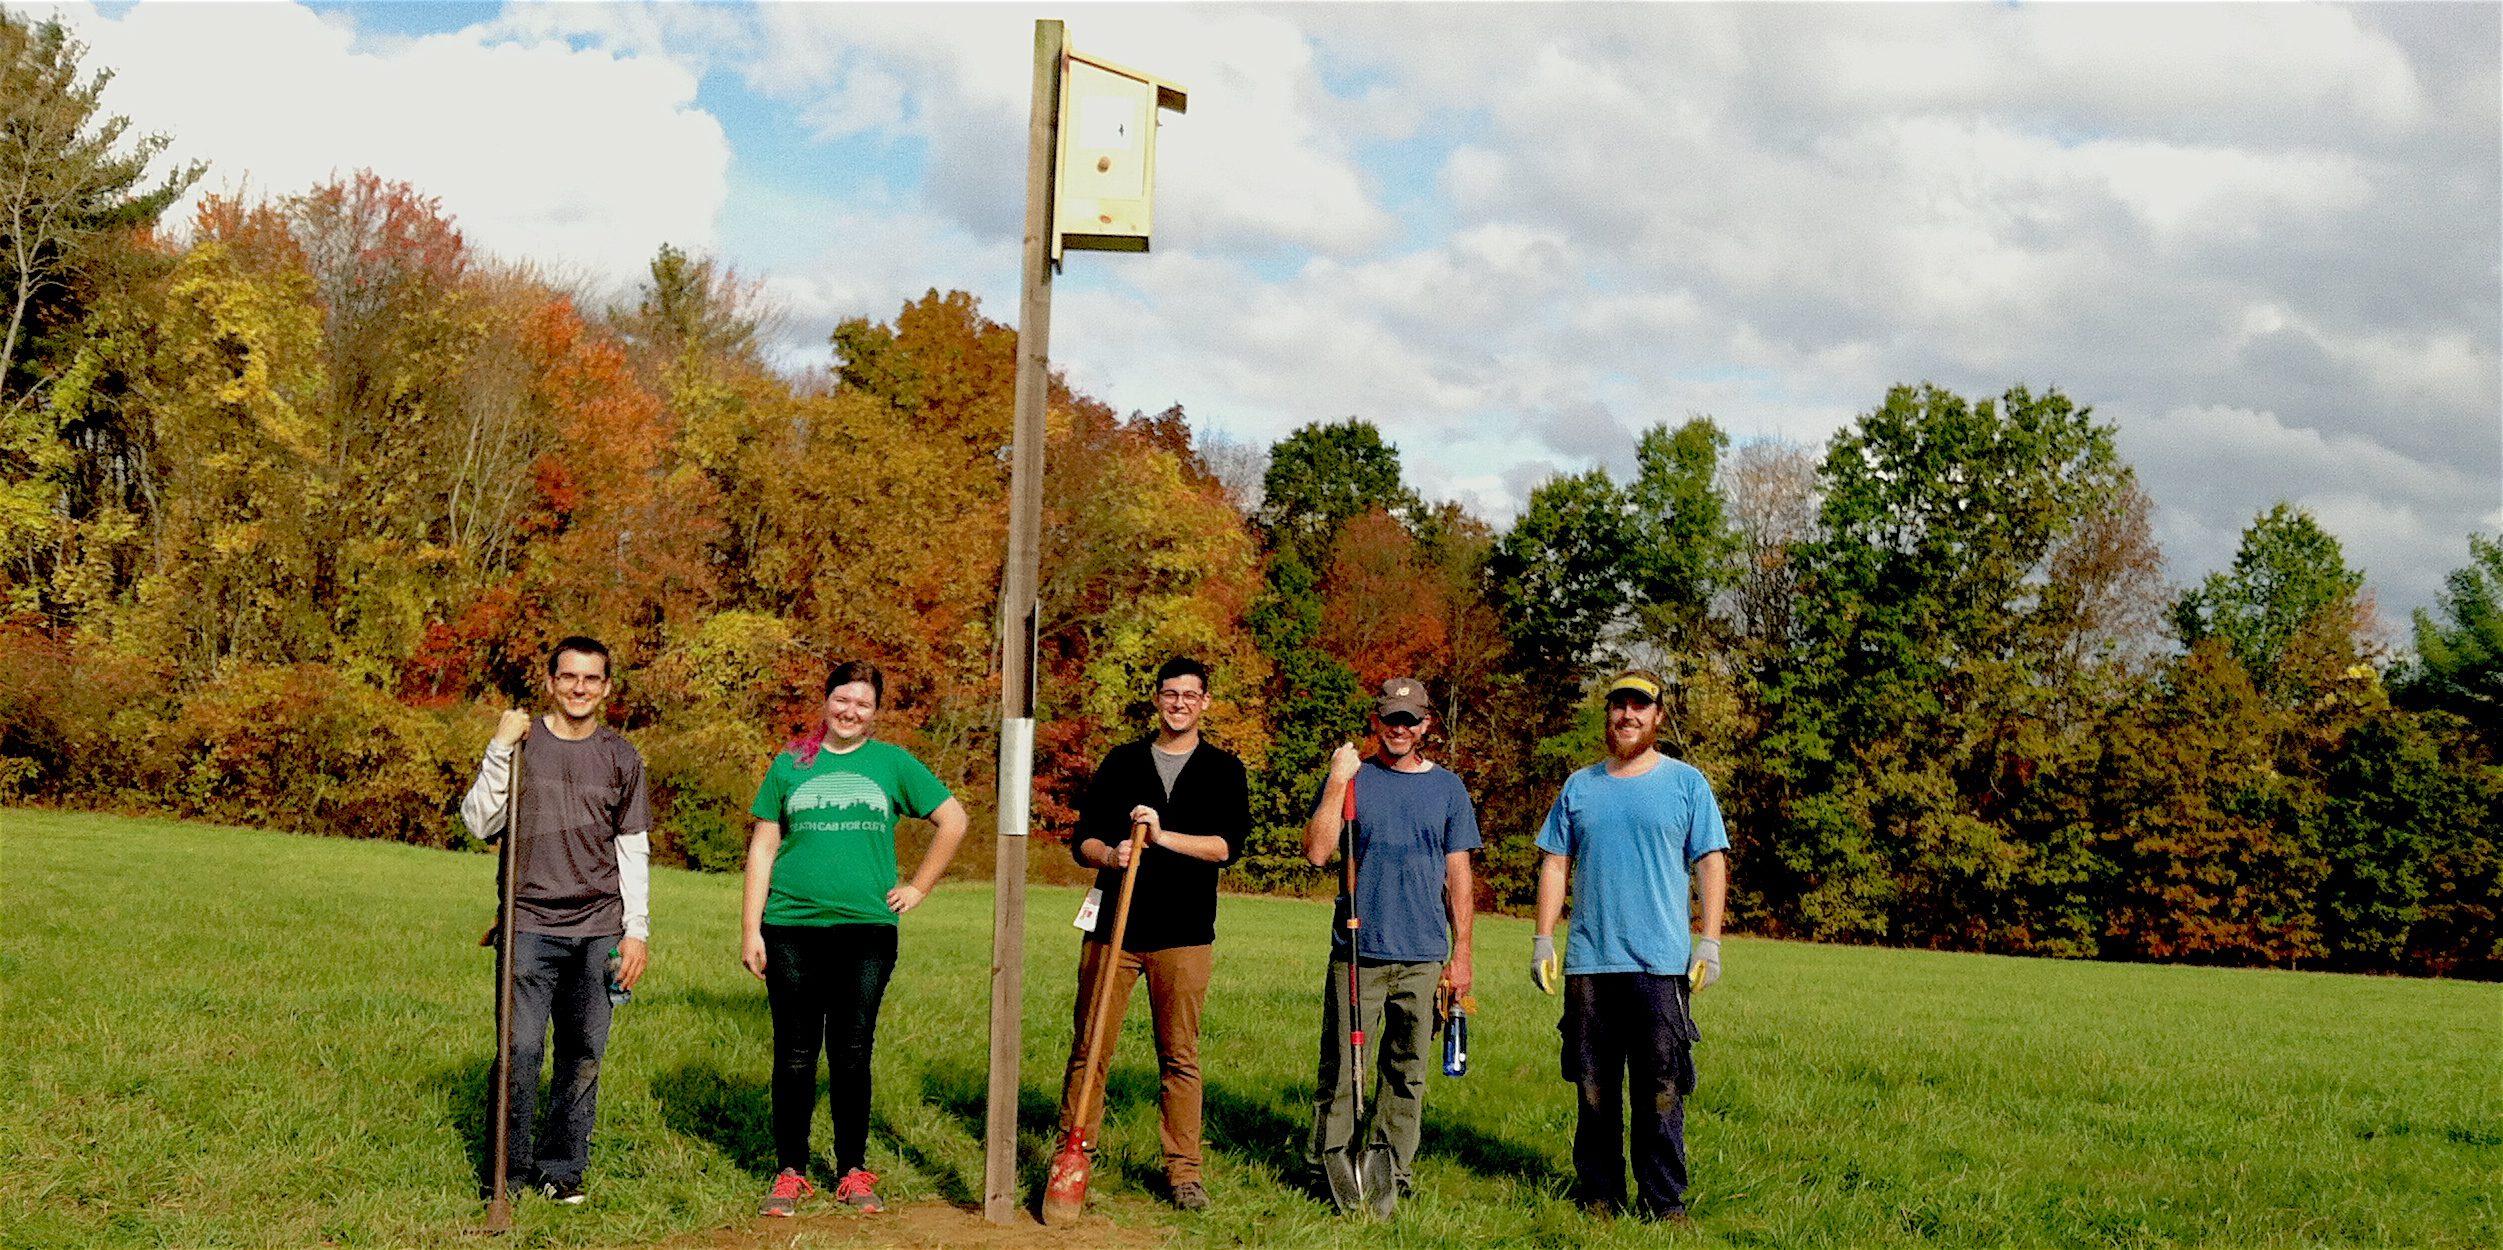 volunteers with Kestrel nest box